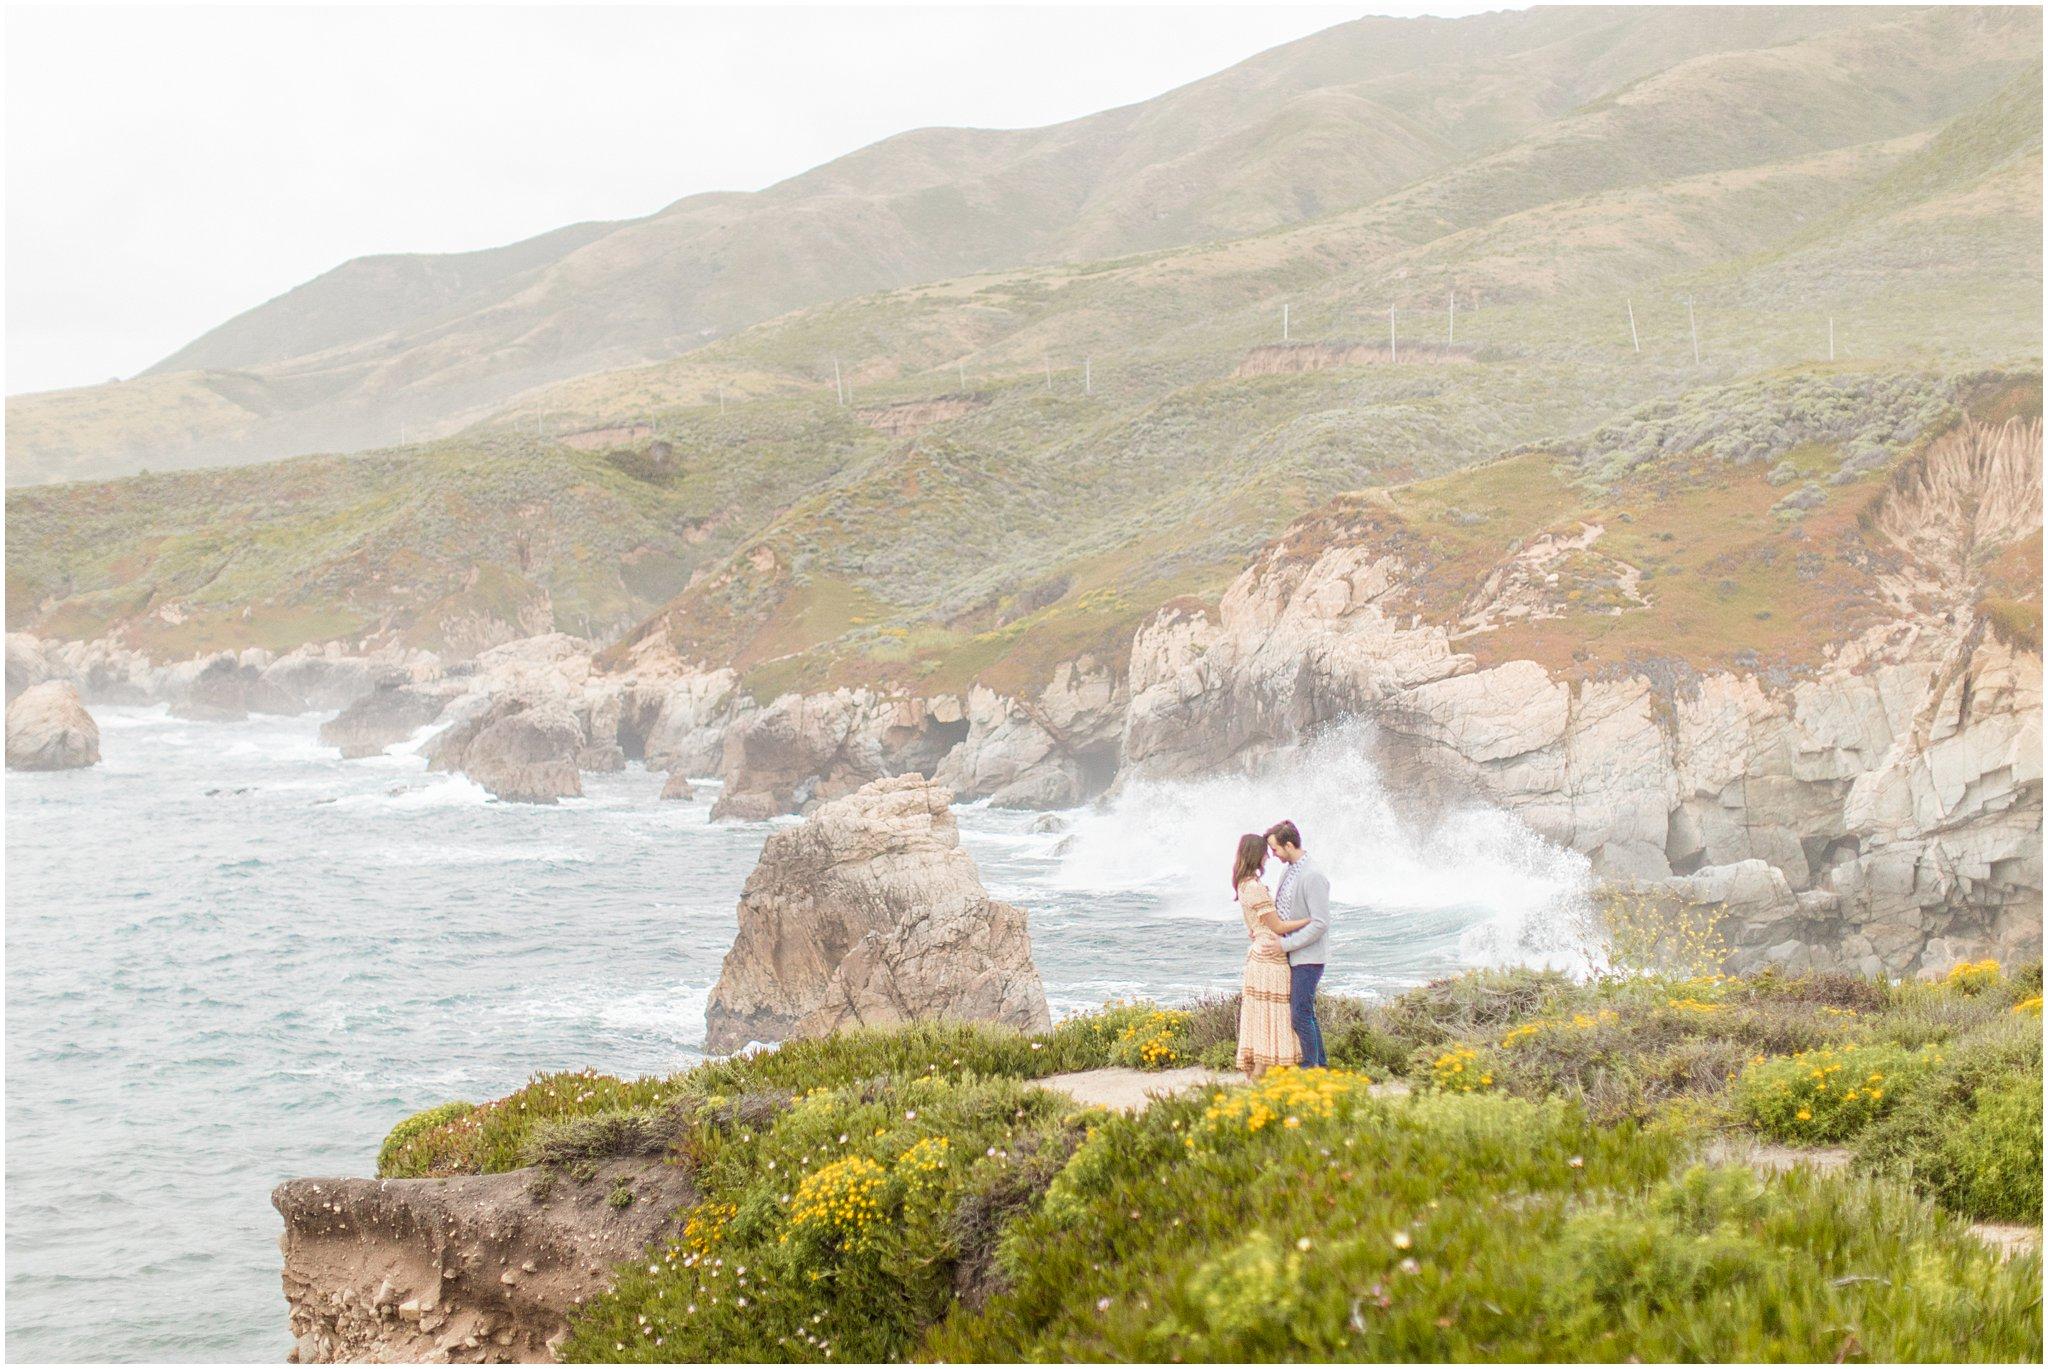 2019 carmel highlands garrapata state park couples portrait session bay area wedding photographer_0011.jpg